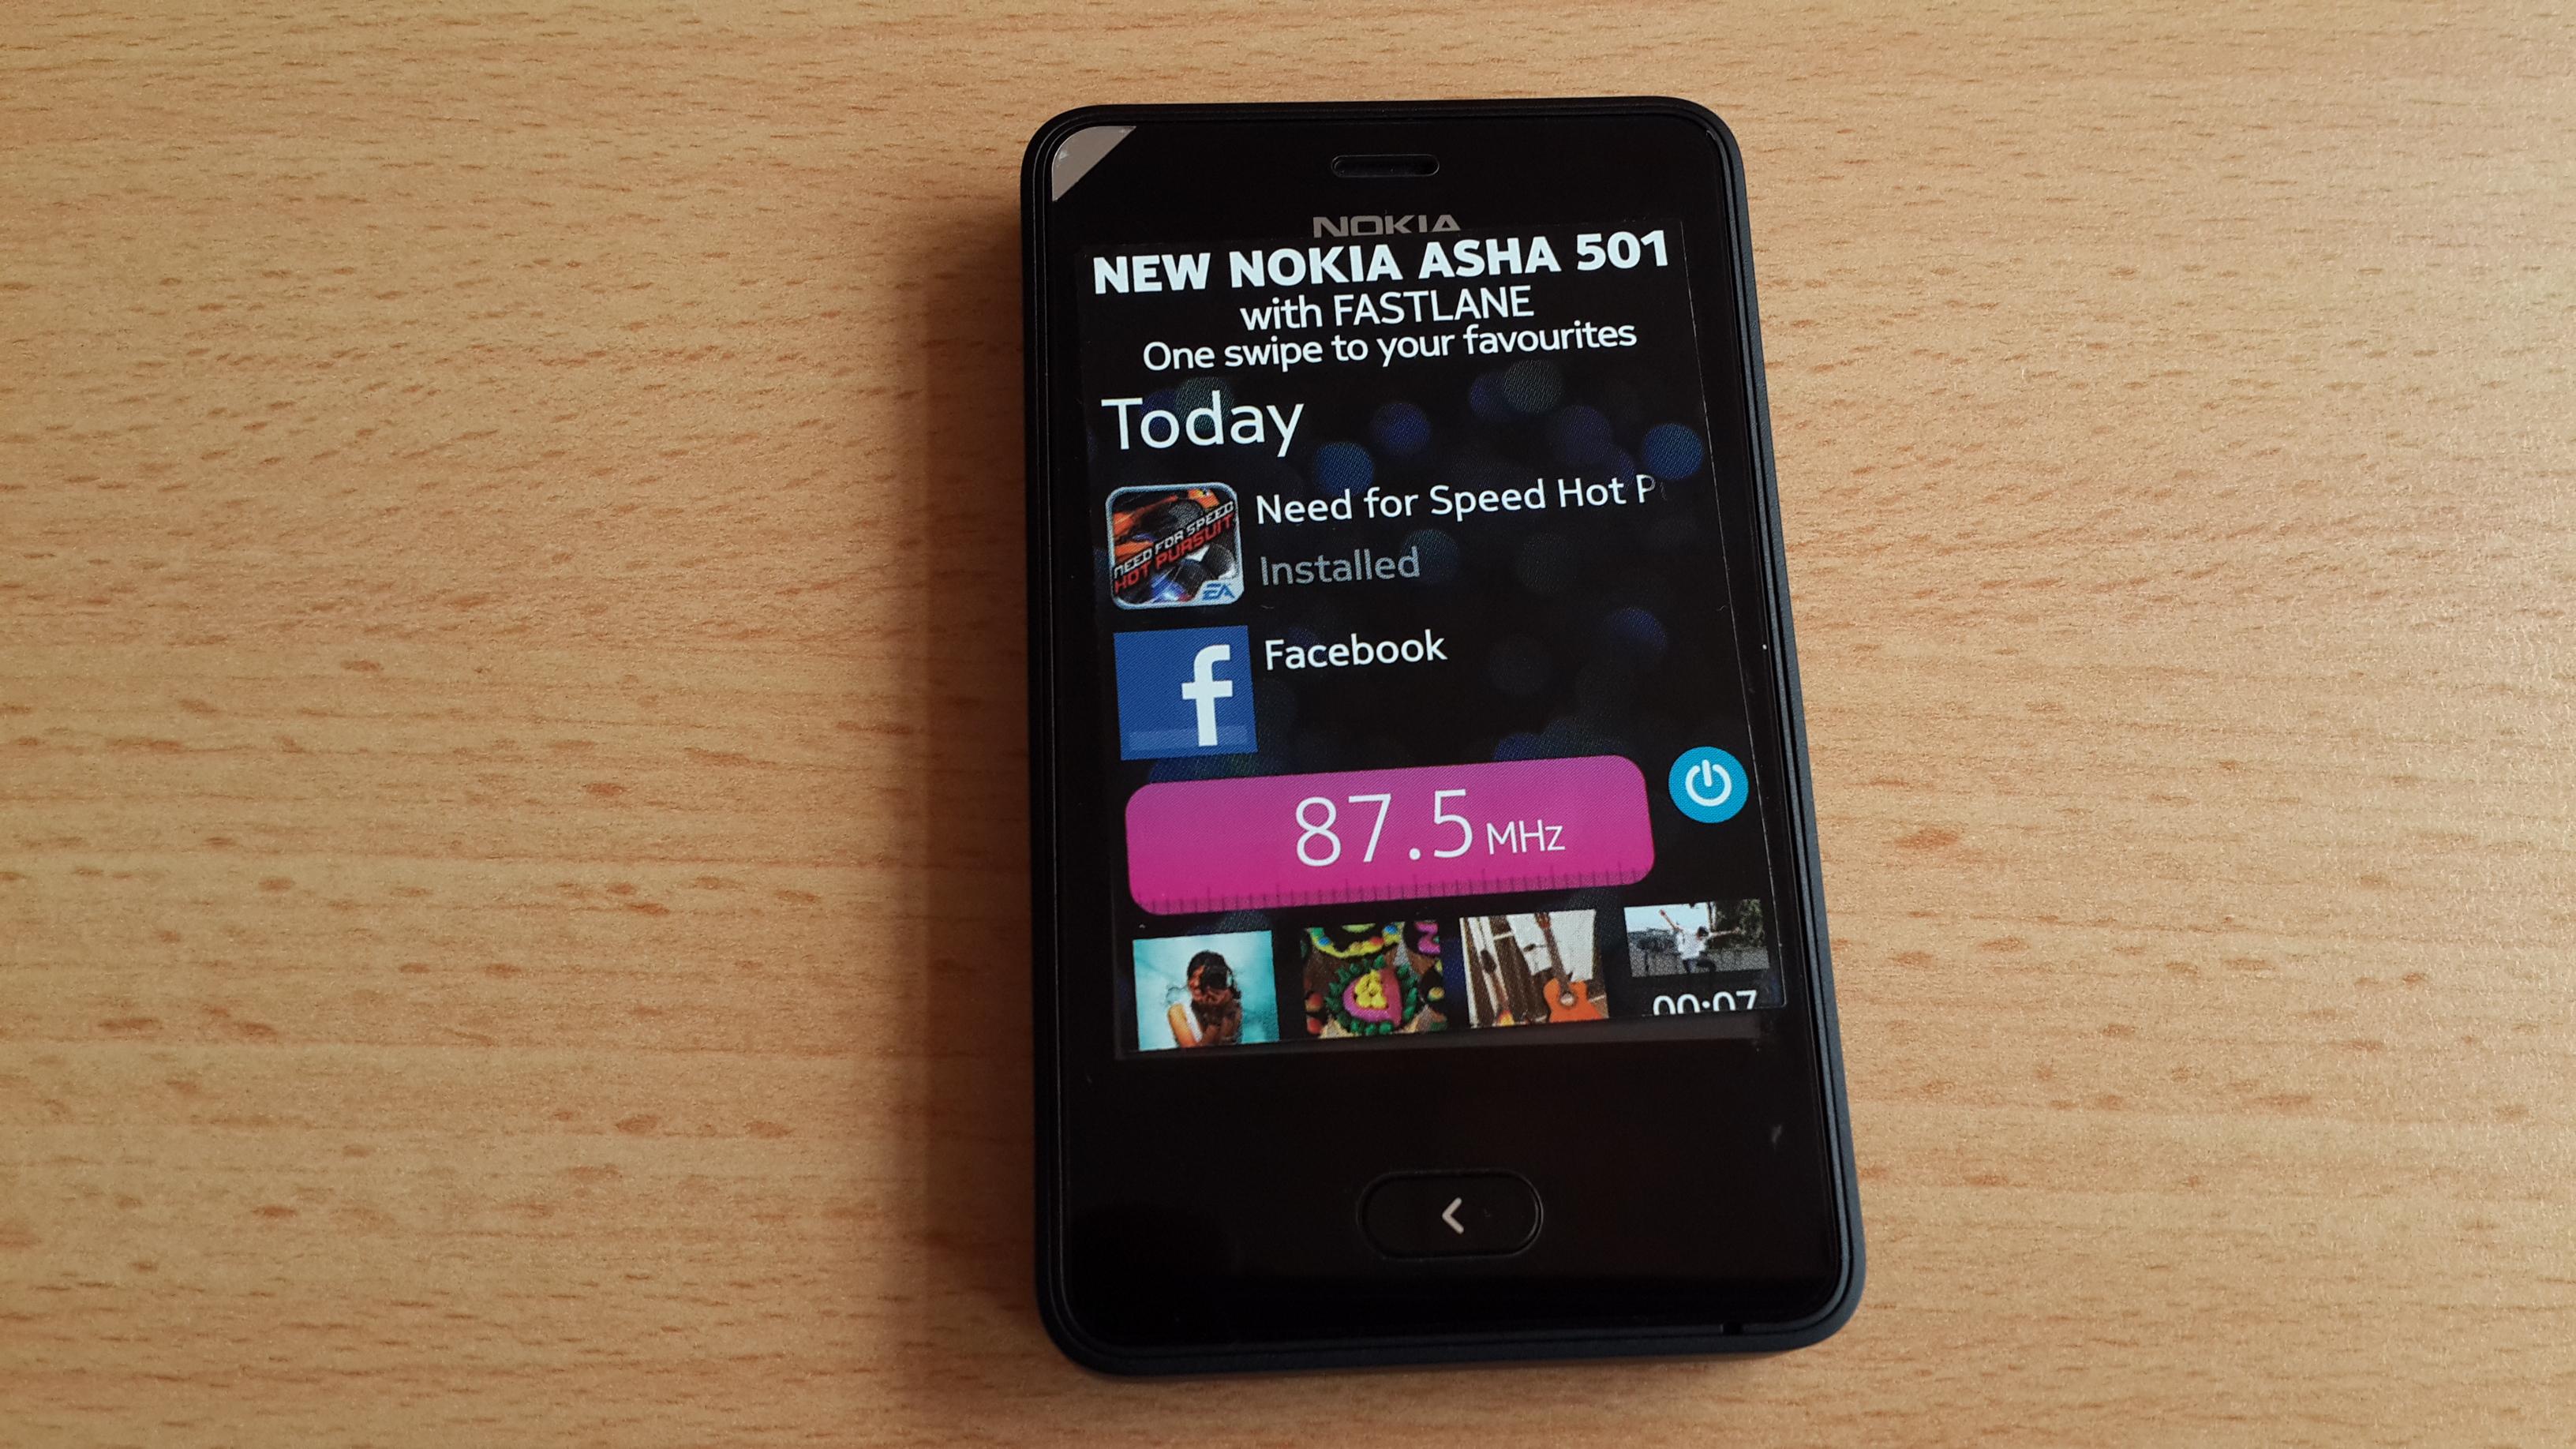 Nokia Asha 501 Dual SIM First Look [Gallery]